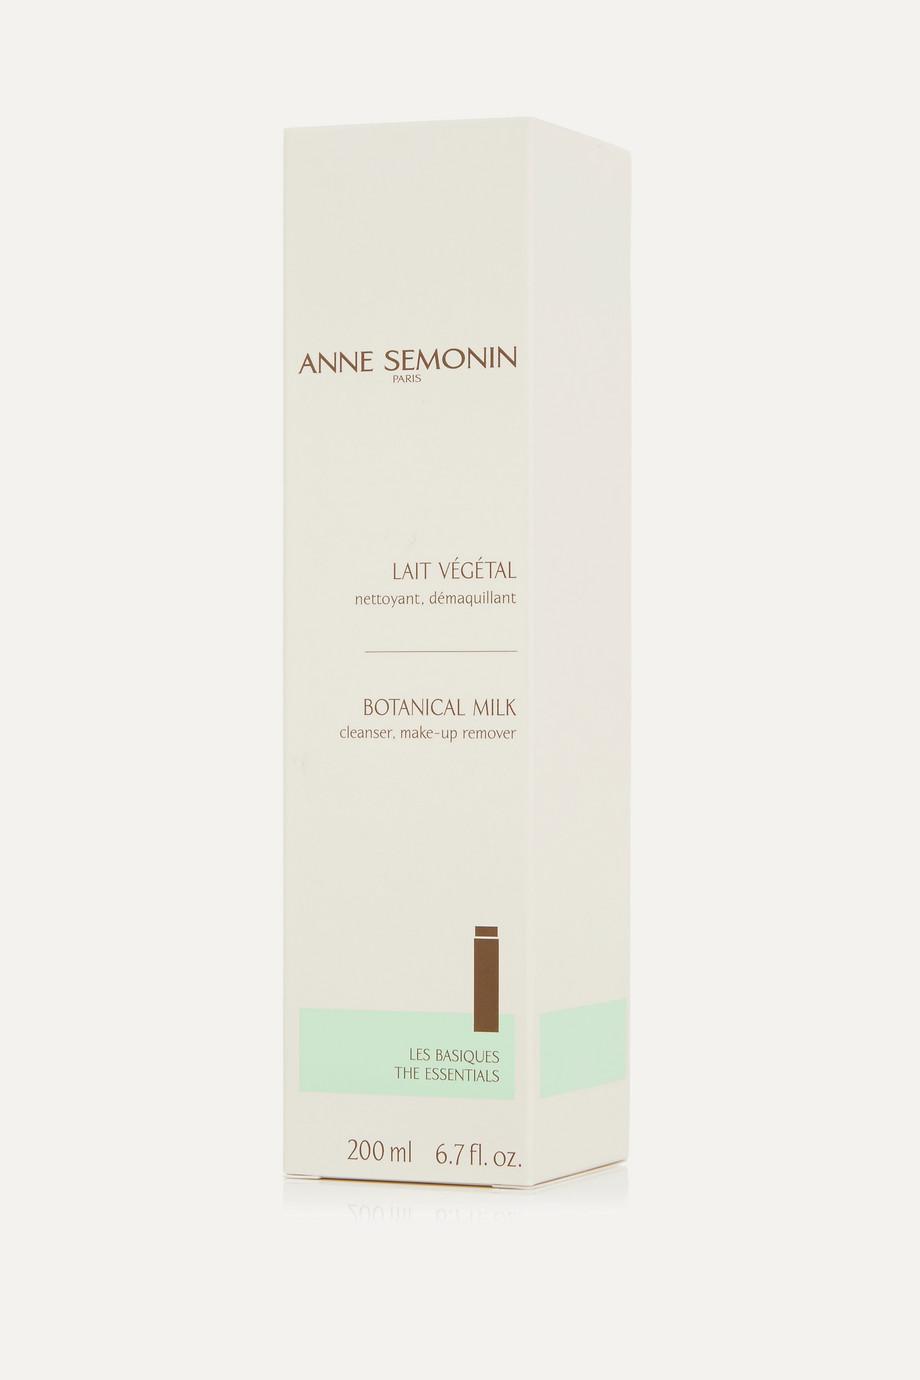 Anne Semonin Botanical Milk, 200ml